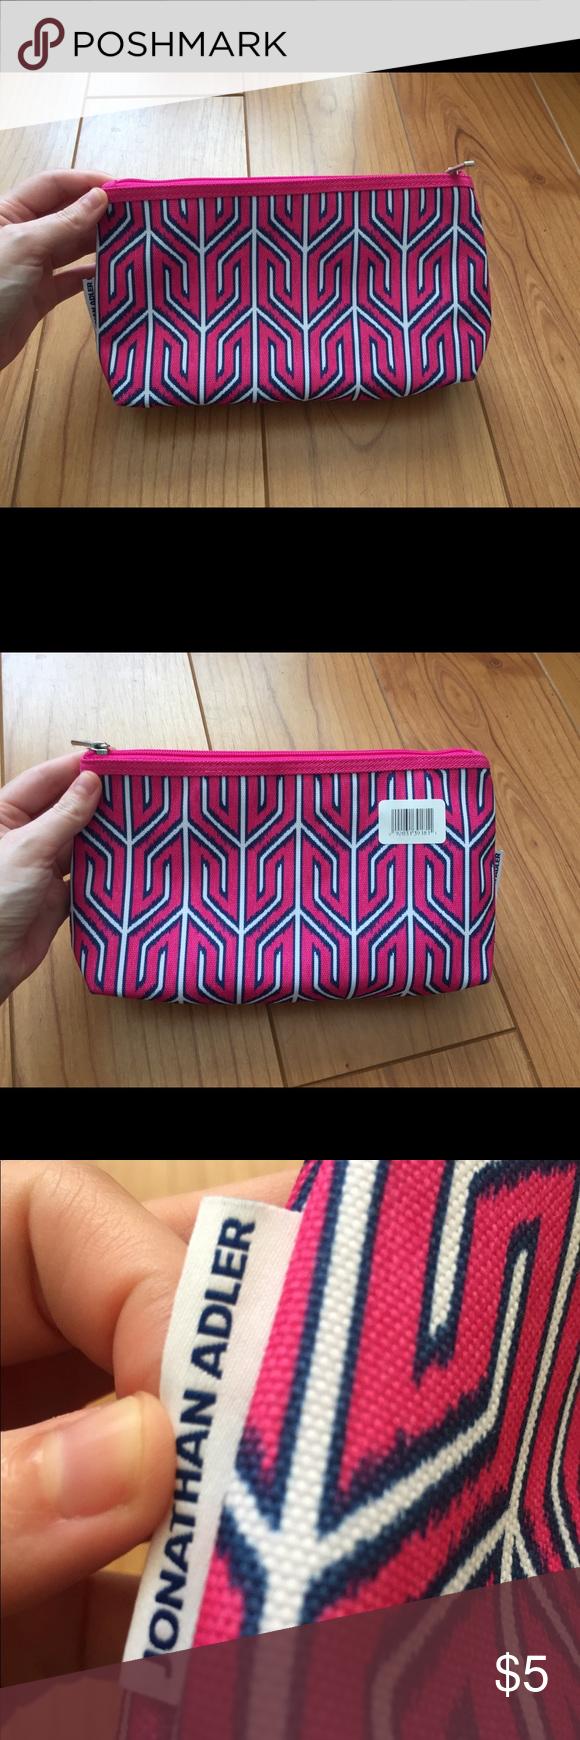 Jonathan Adler / Clinique Makeup Bag Makeup bag